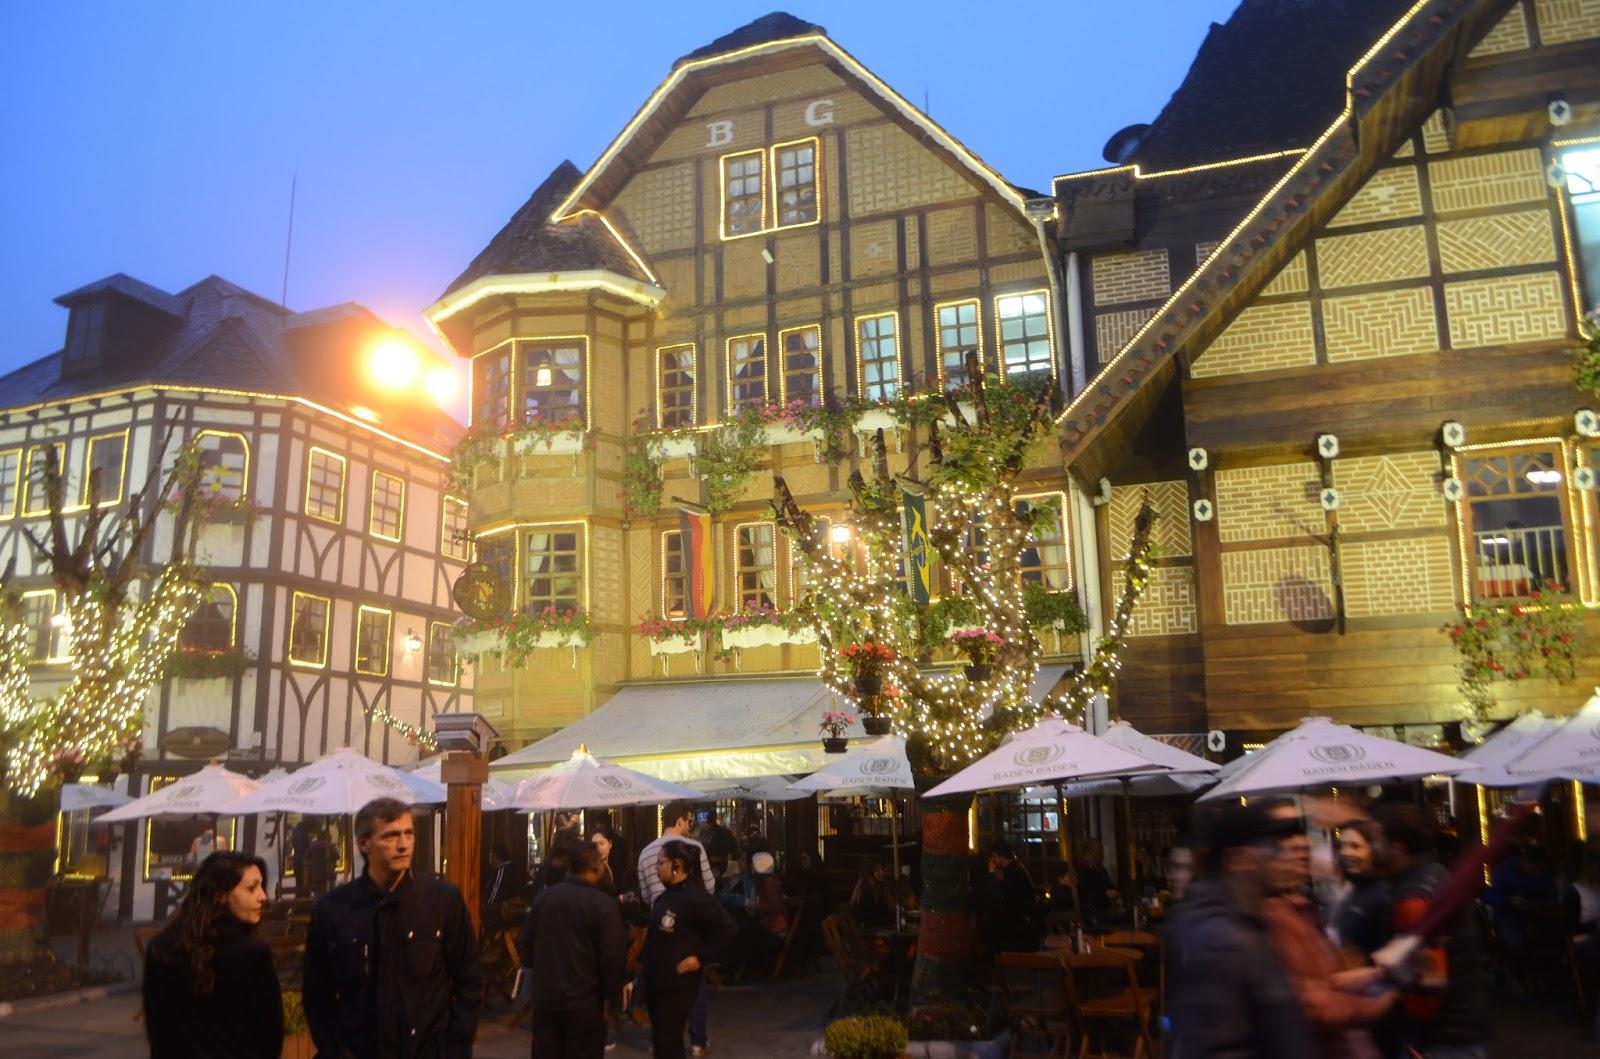 Restaurante-Baden-Baden